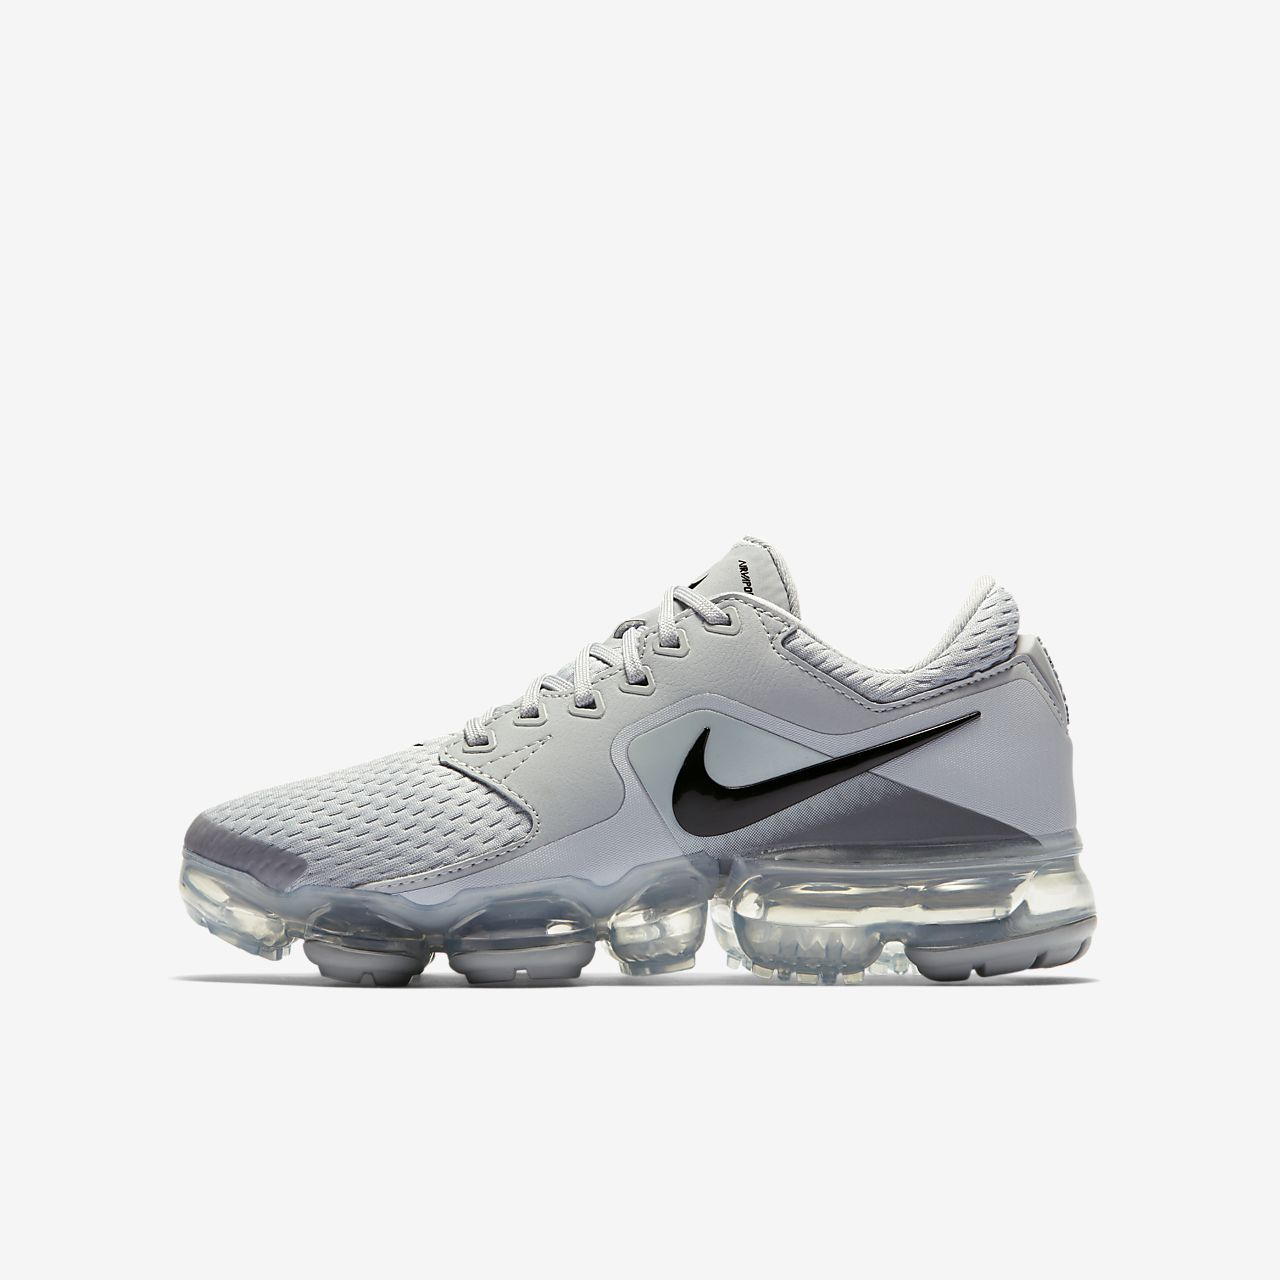 Âgé Enfant In Chaussure Fr Vapormax Pour 7x14a7 Nike Plus Air EAaqpqx